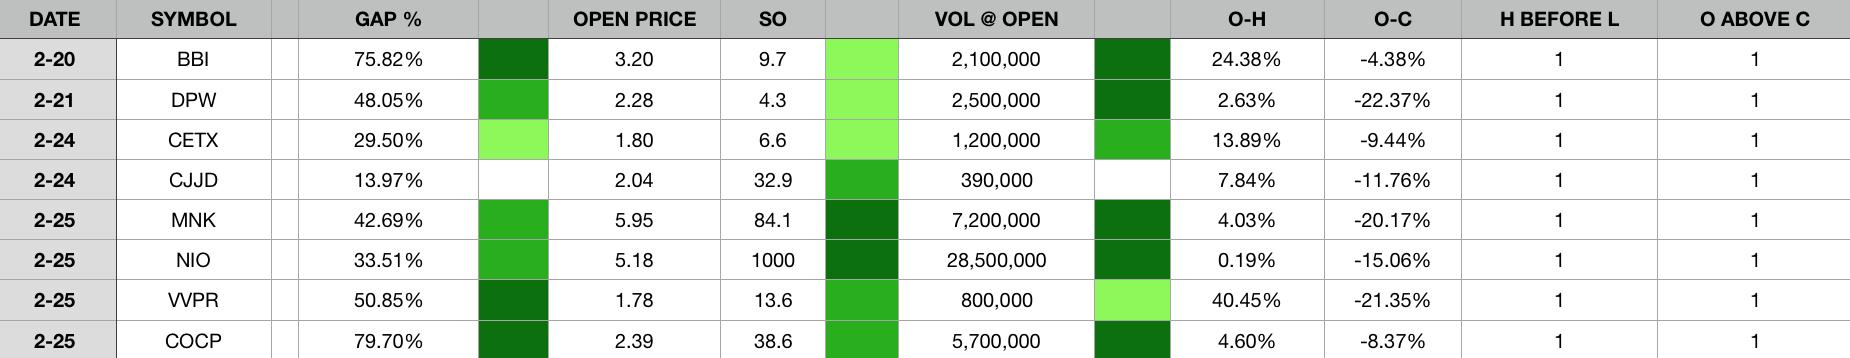 stock day trading data spreadsheet